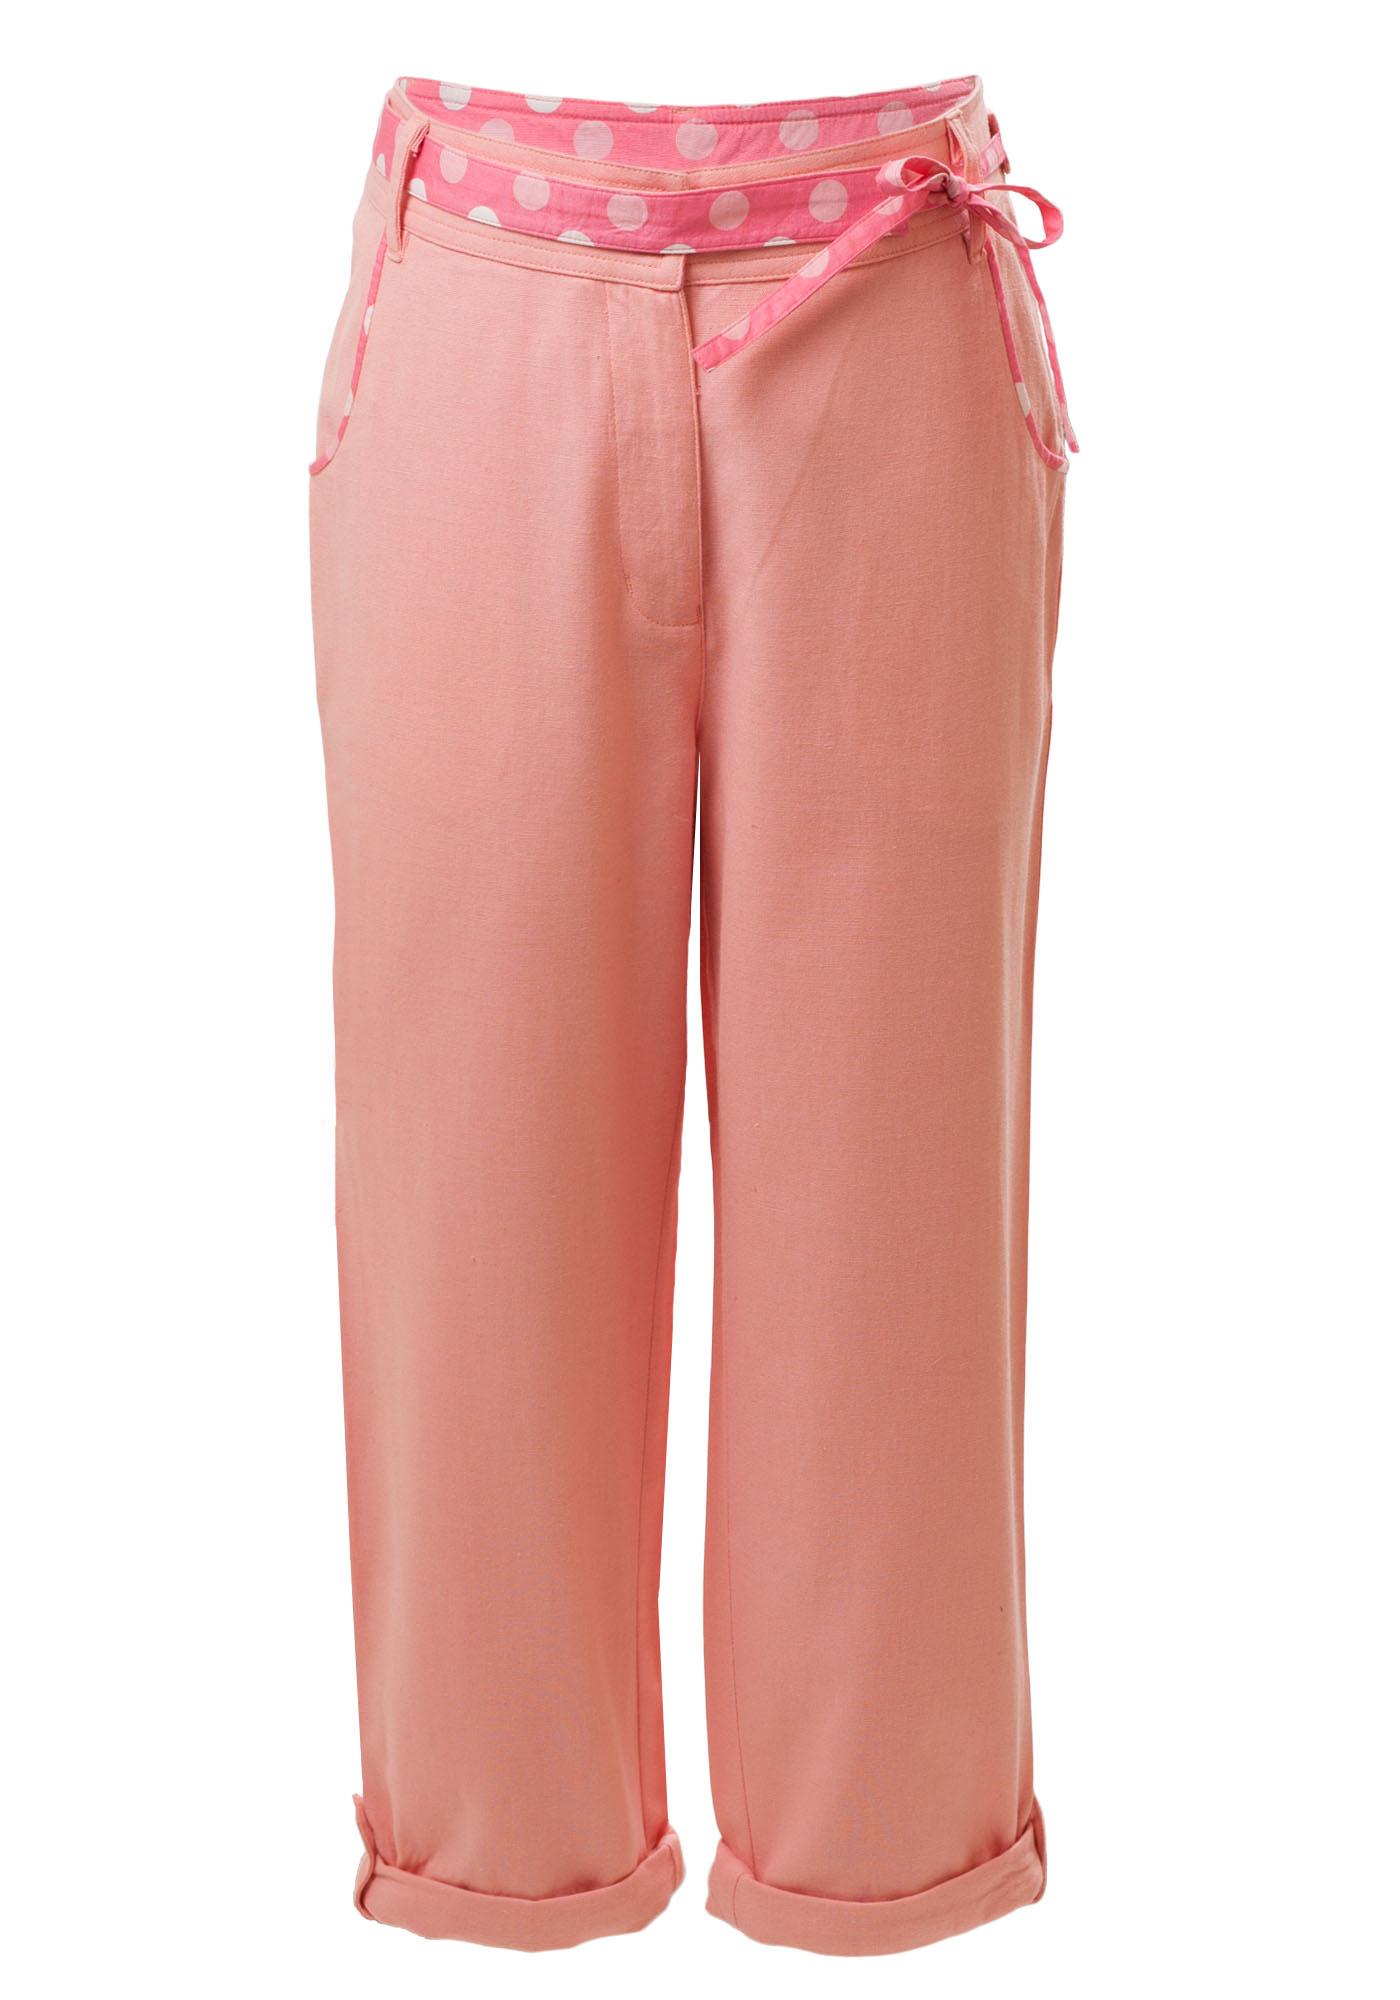 MINC Petite - Buy Sunset Girls Capris in Berry Pink Cotton Online